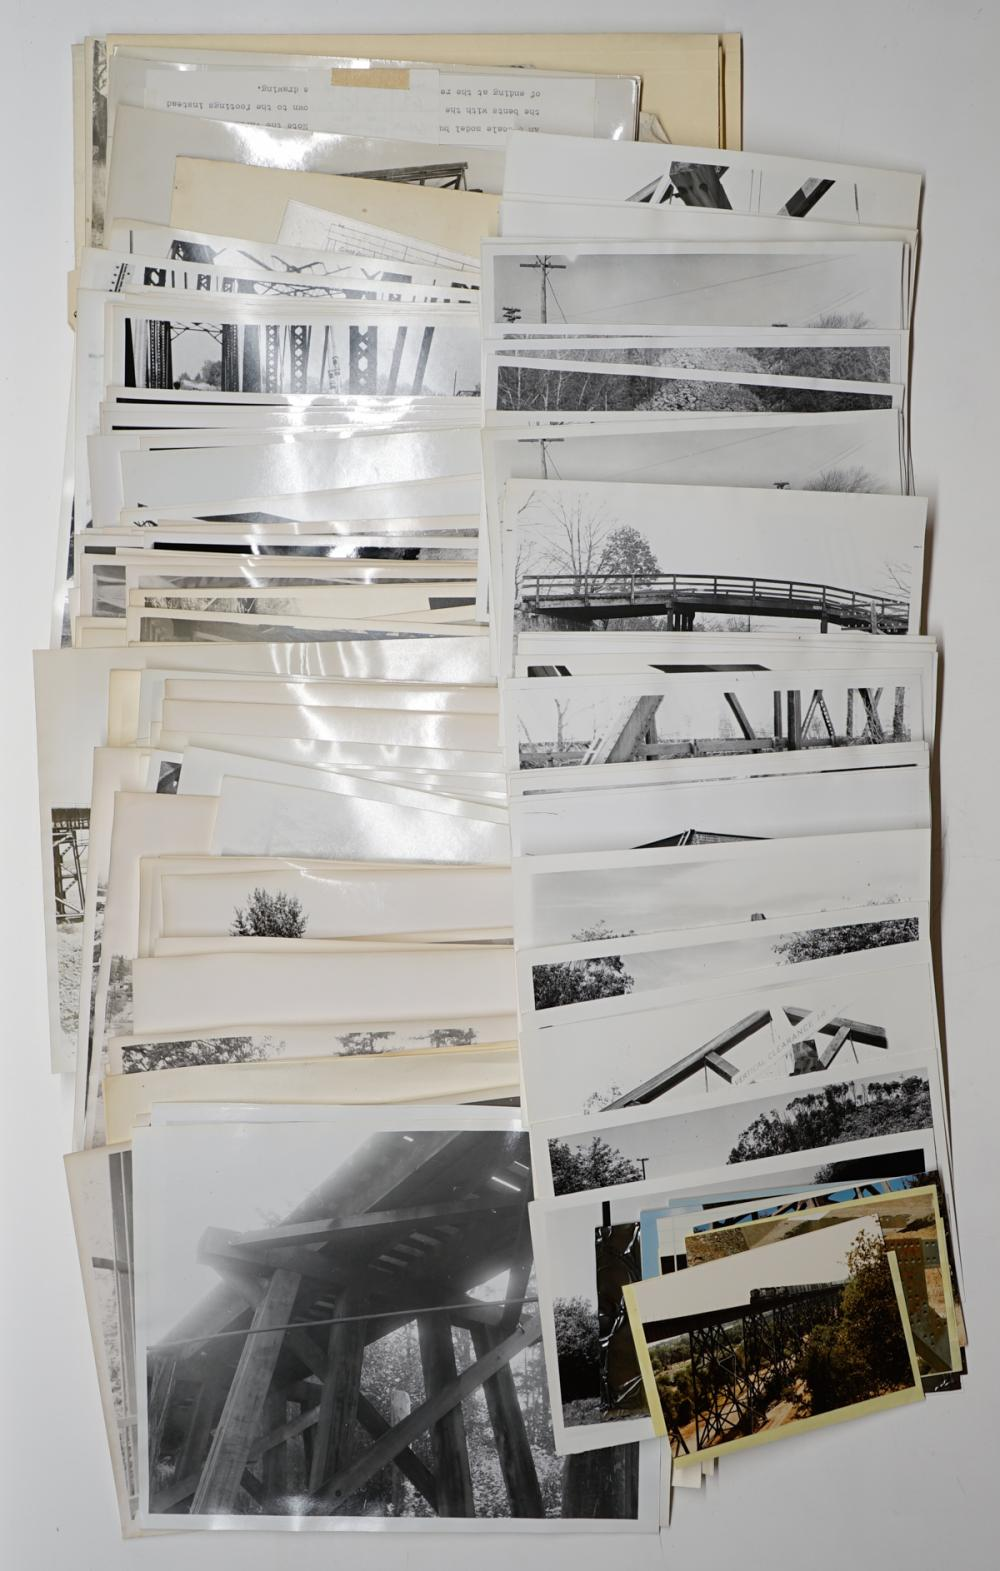 Lot 558: [Railroad Bridges] Al Armitage Collection (120)